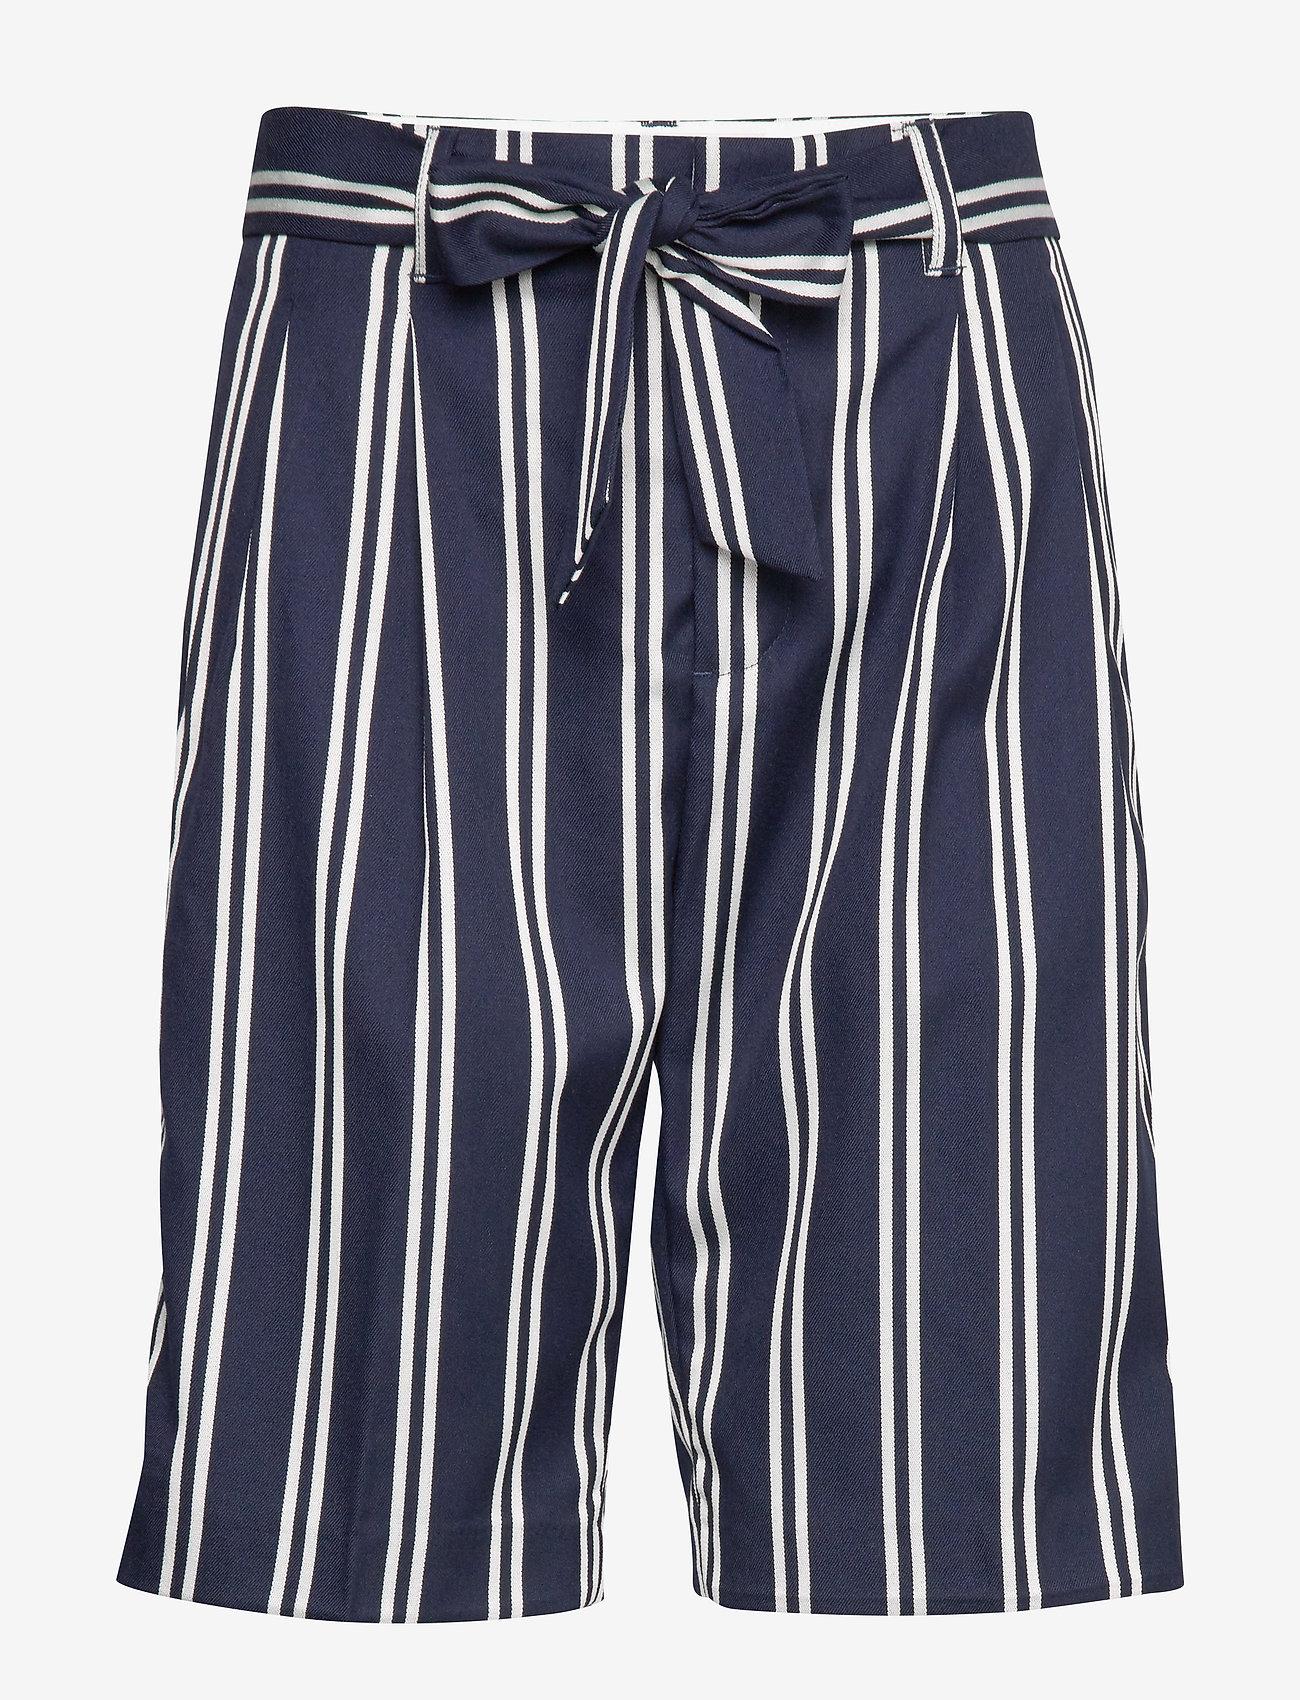 Scotch & Soda - Longer length tailored shorts - bermuda-shortsit - combo r - 0